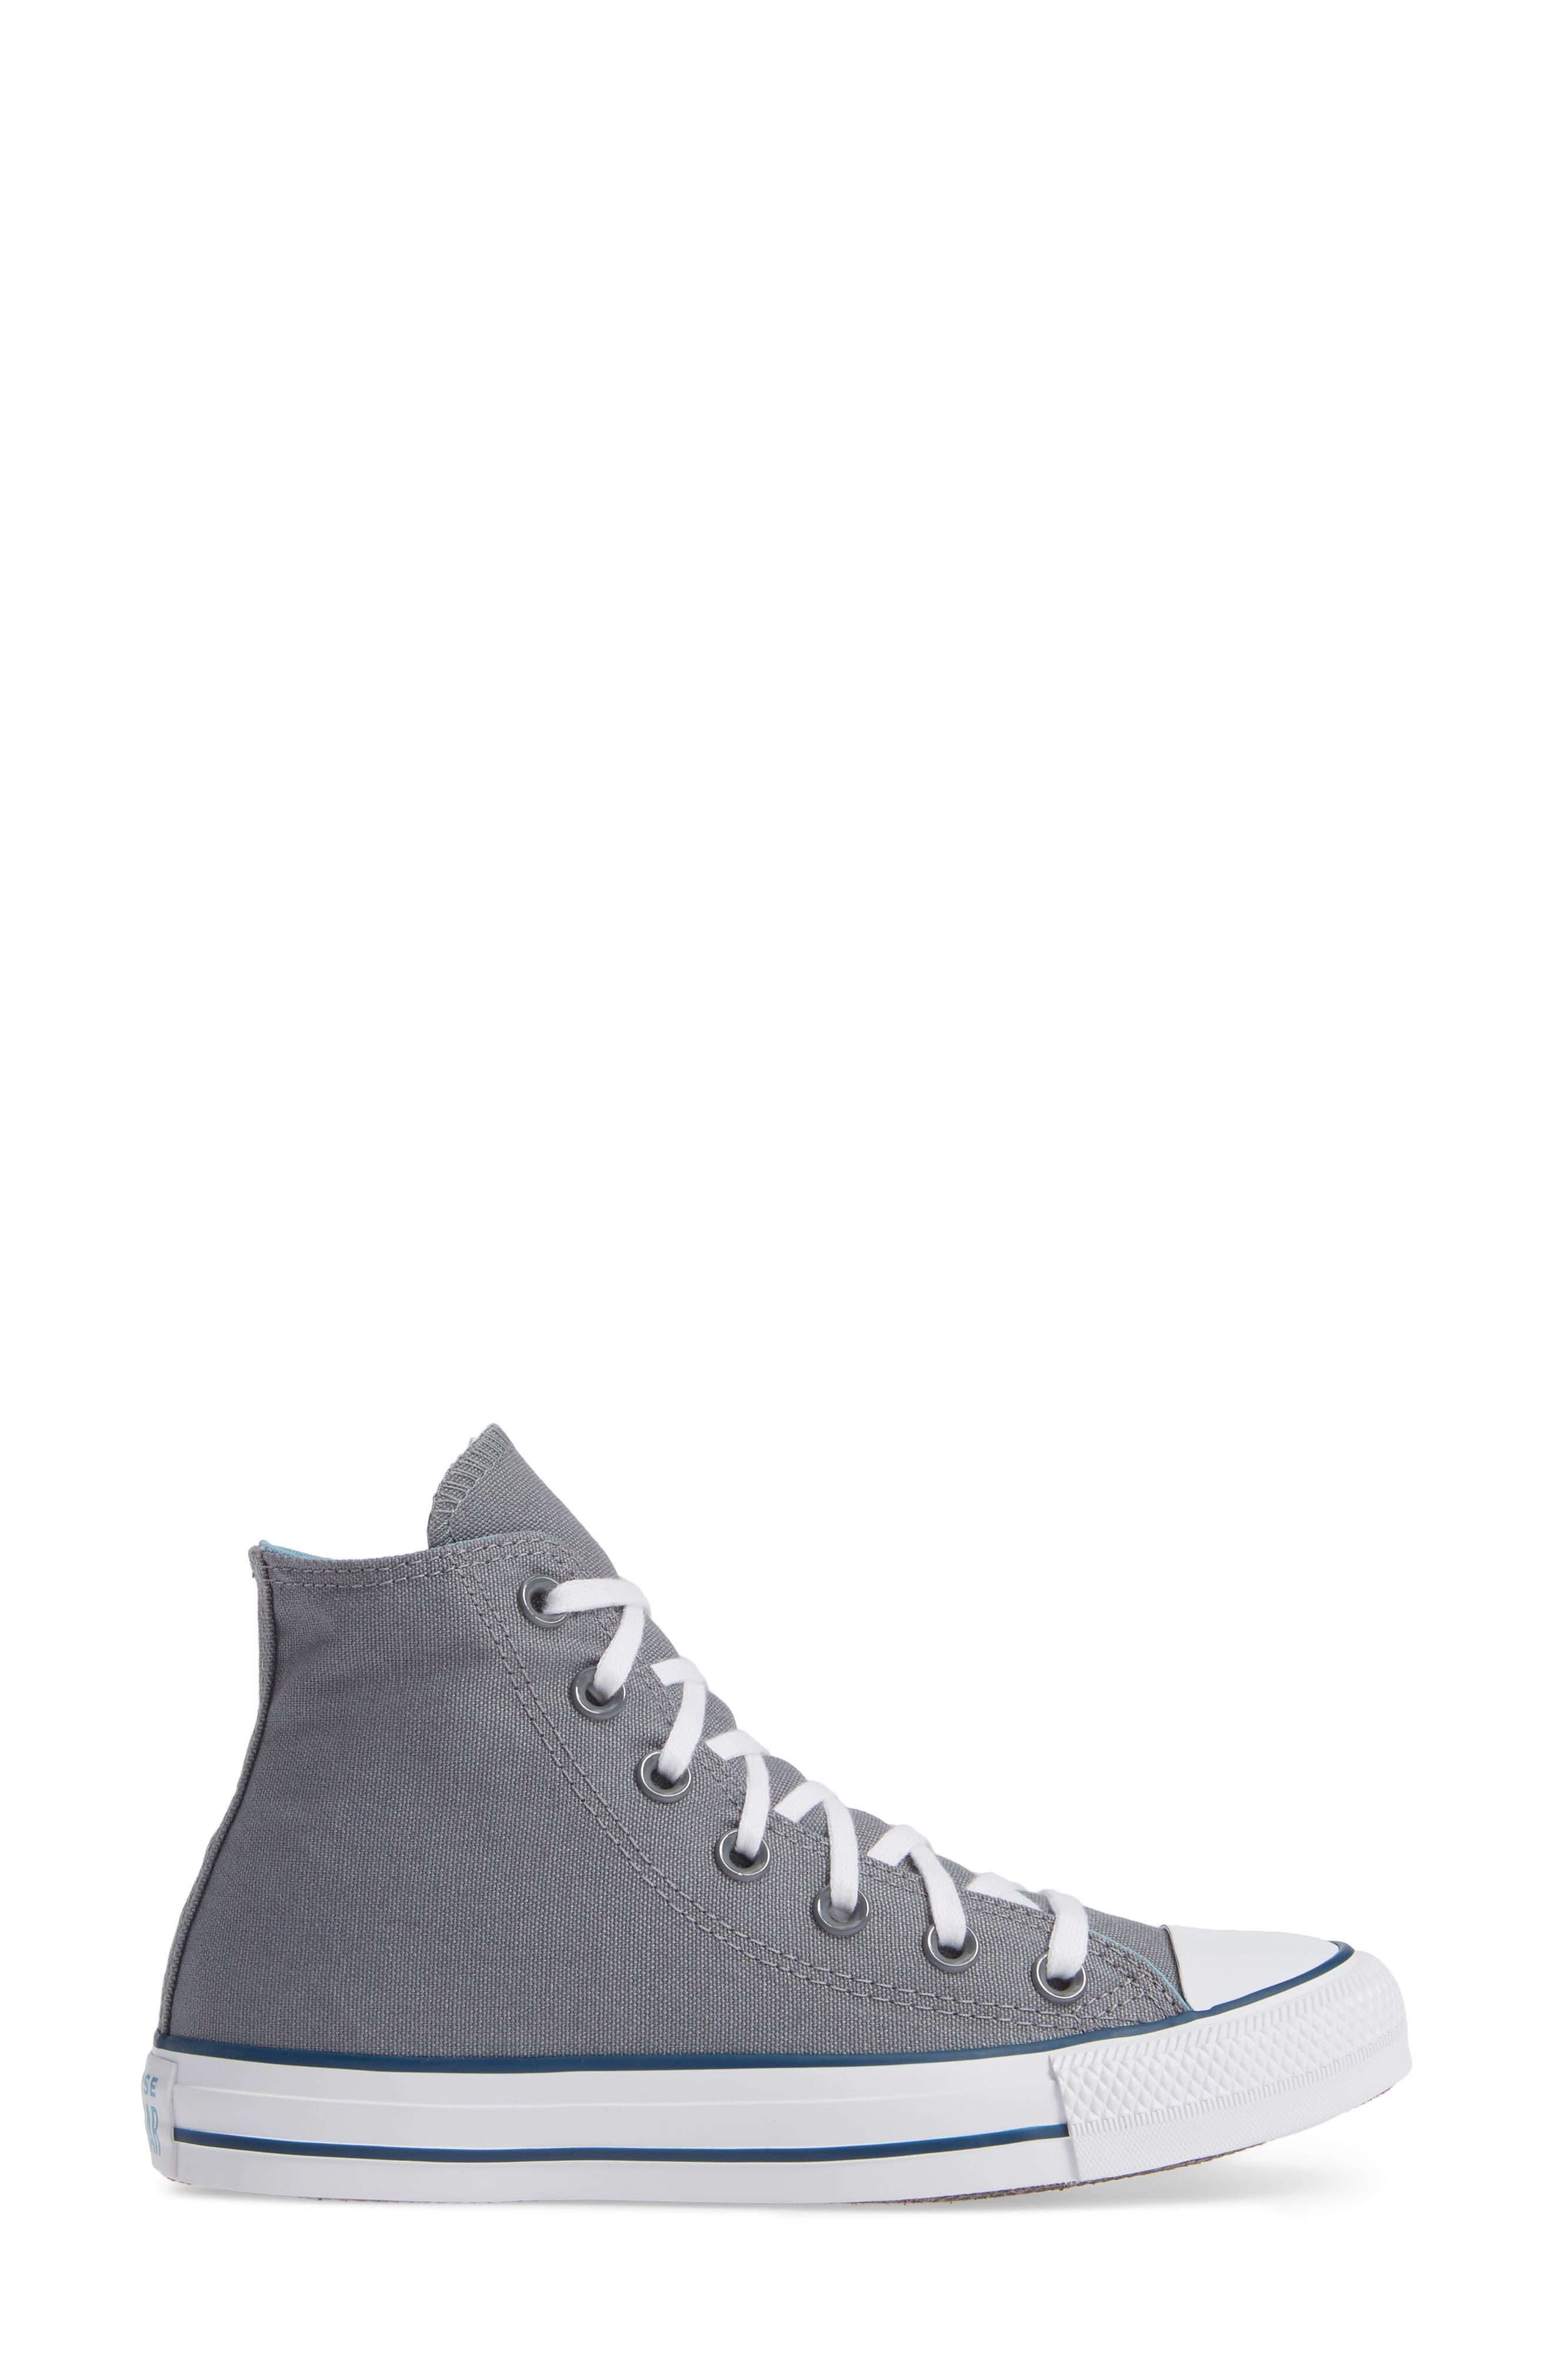 CONVERSE, Chuck Taylor<sup>®</sup> All Star<sup>®</sup> Seasonal Hi Sneaker, Alternate thumbnail 3, color, 039